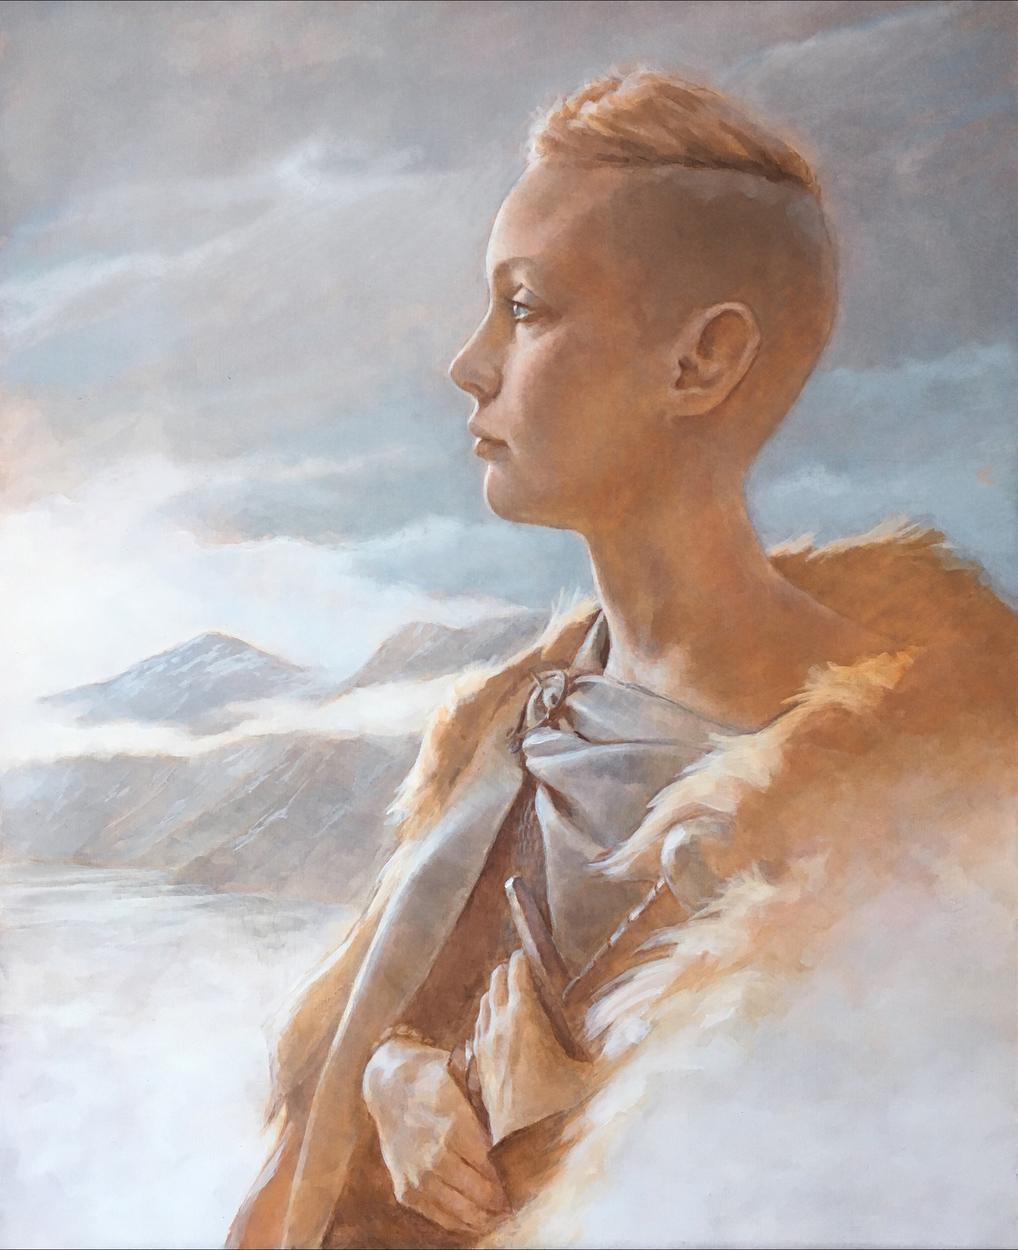 Elina Artwork by David Brasgalla